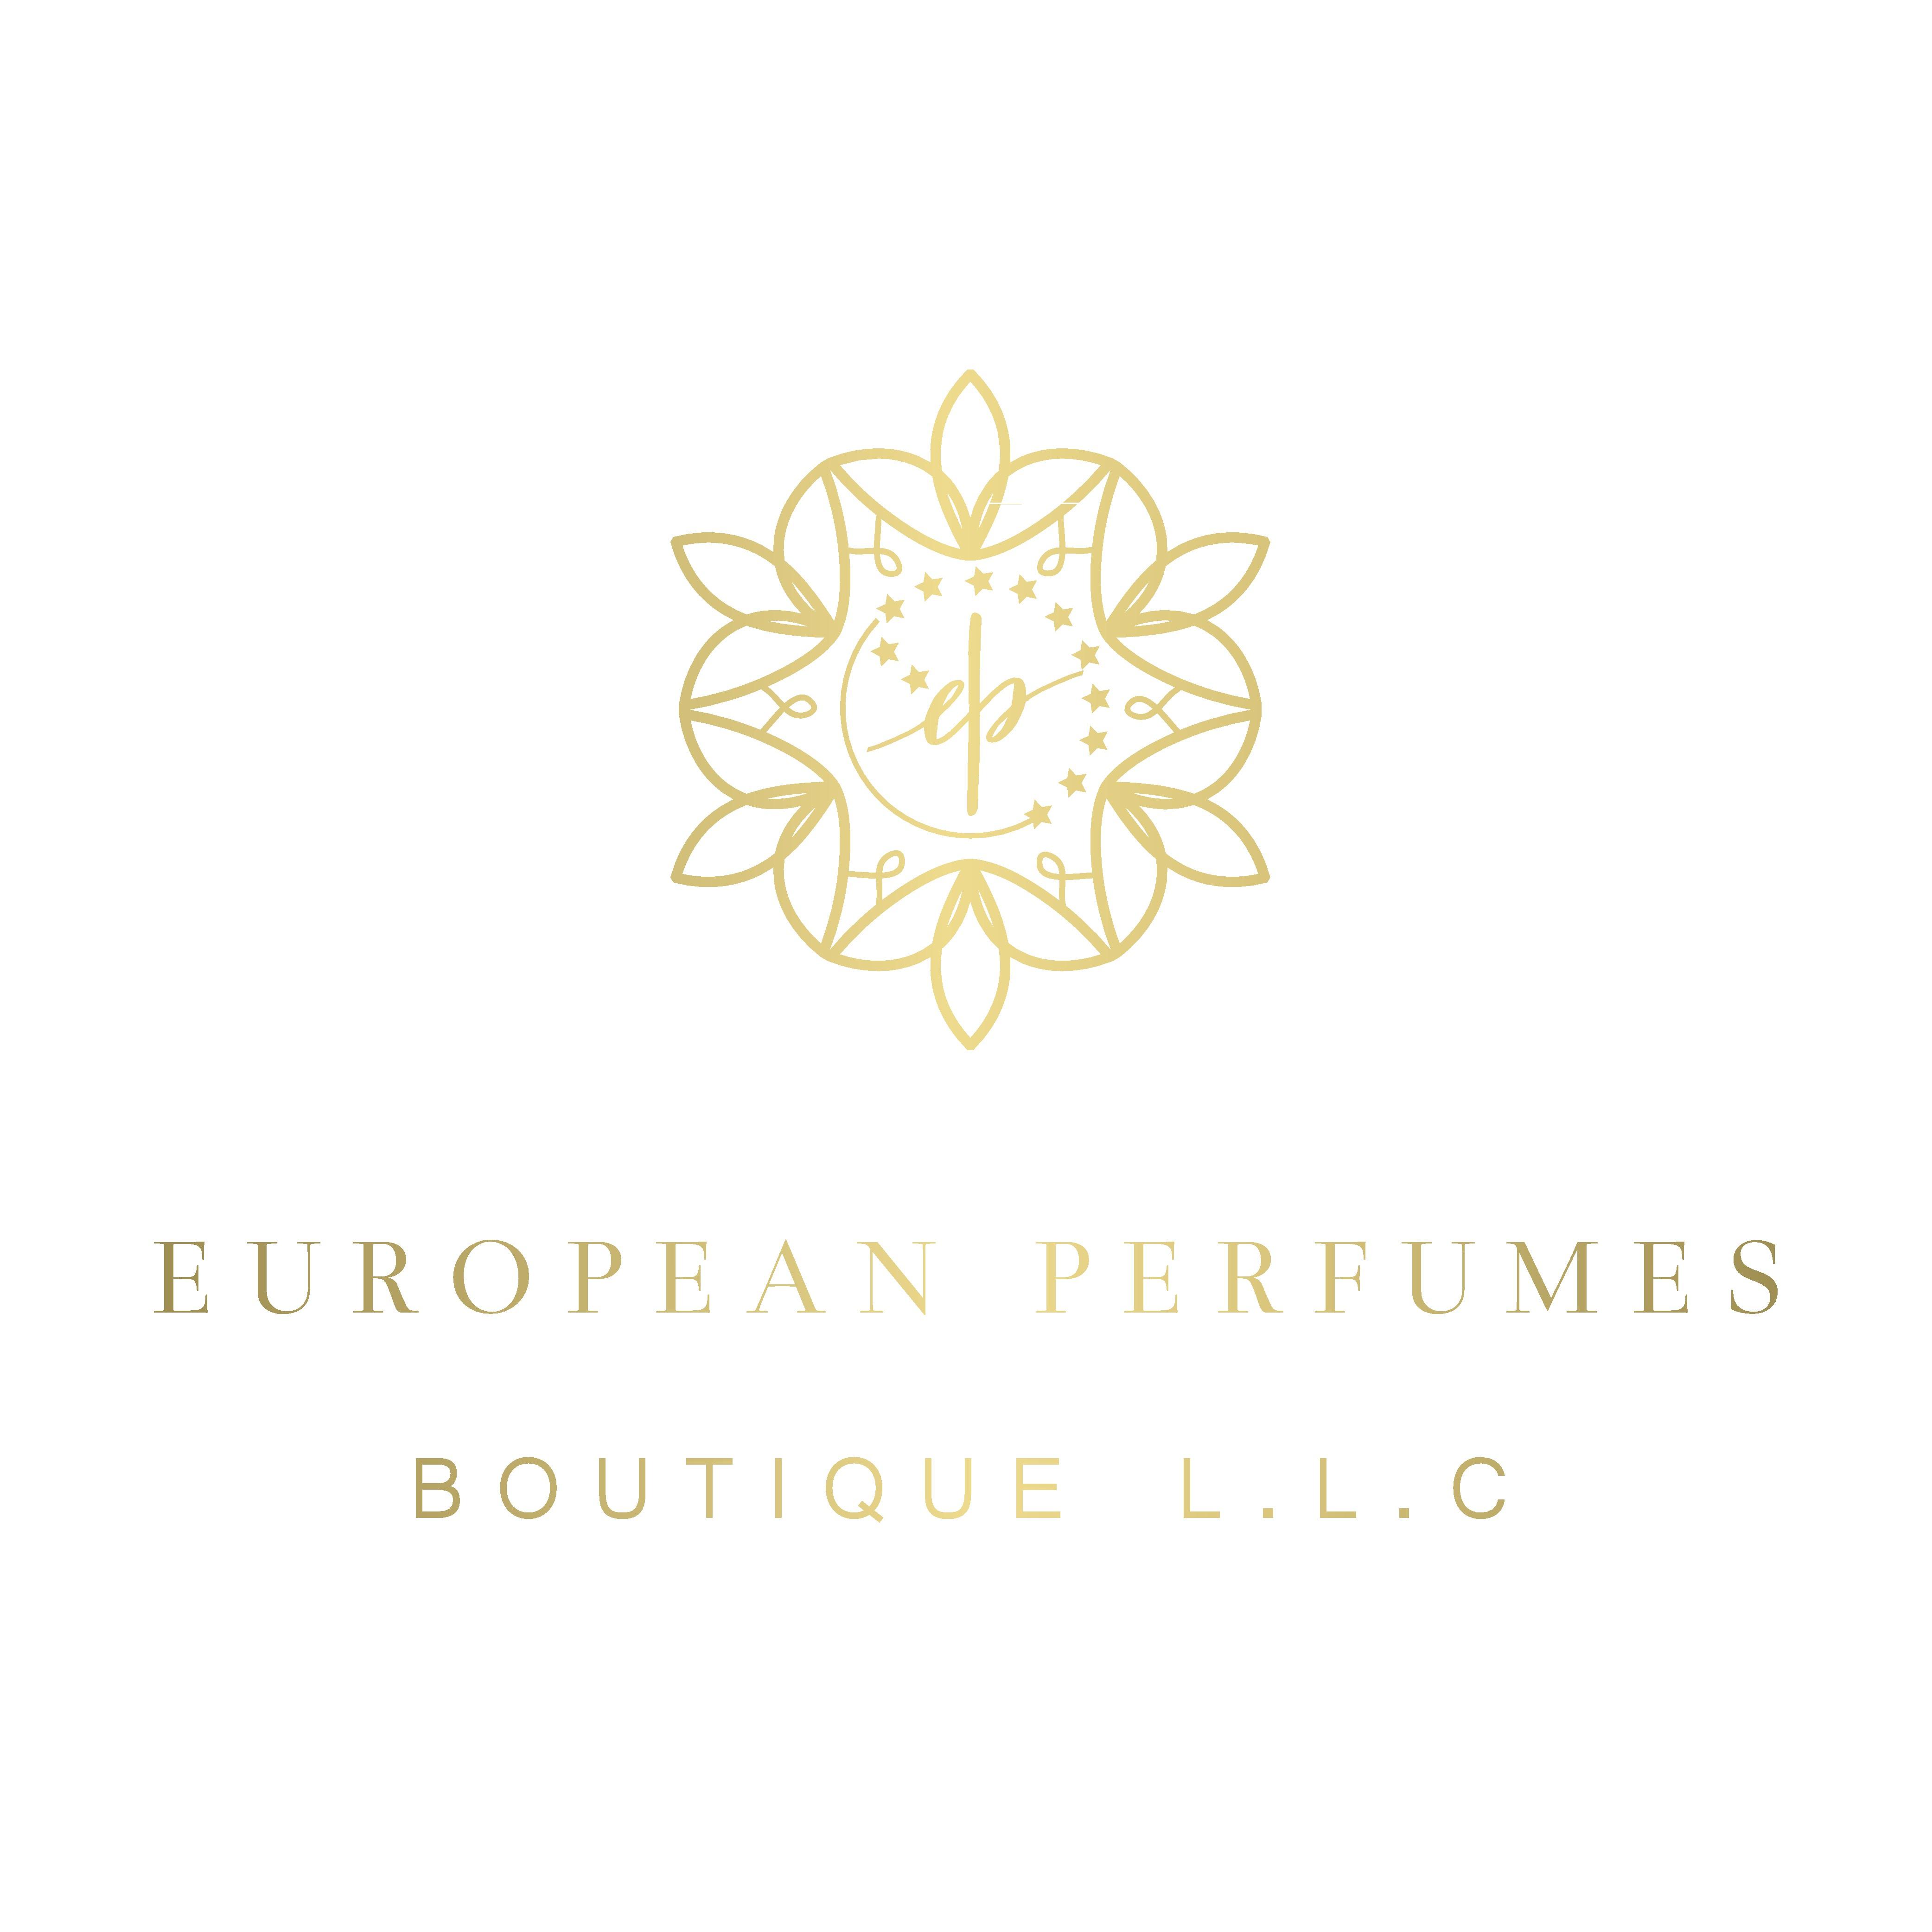 Create my logo for European Perfumes Boutique L.L.C